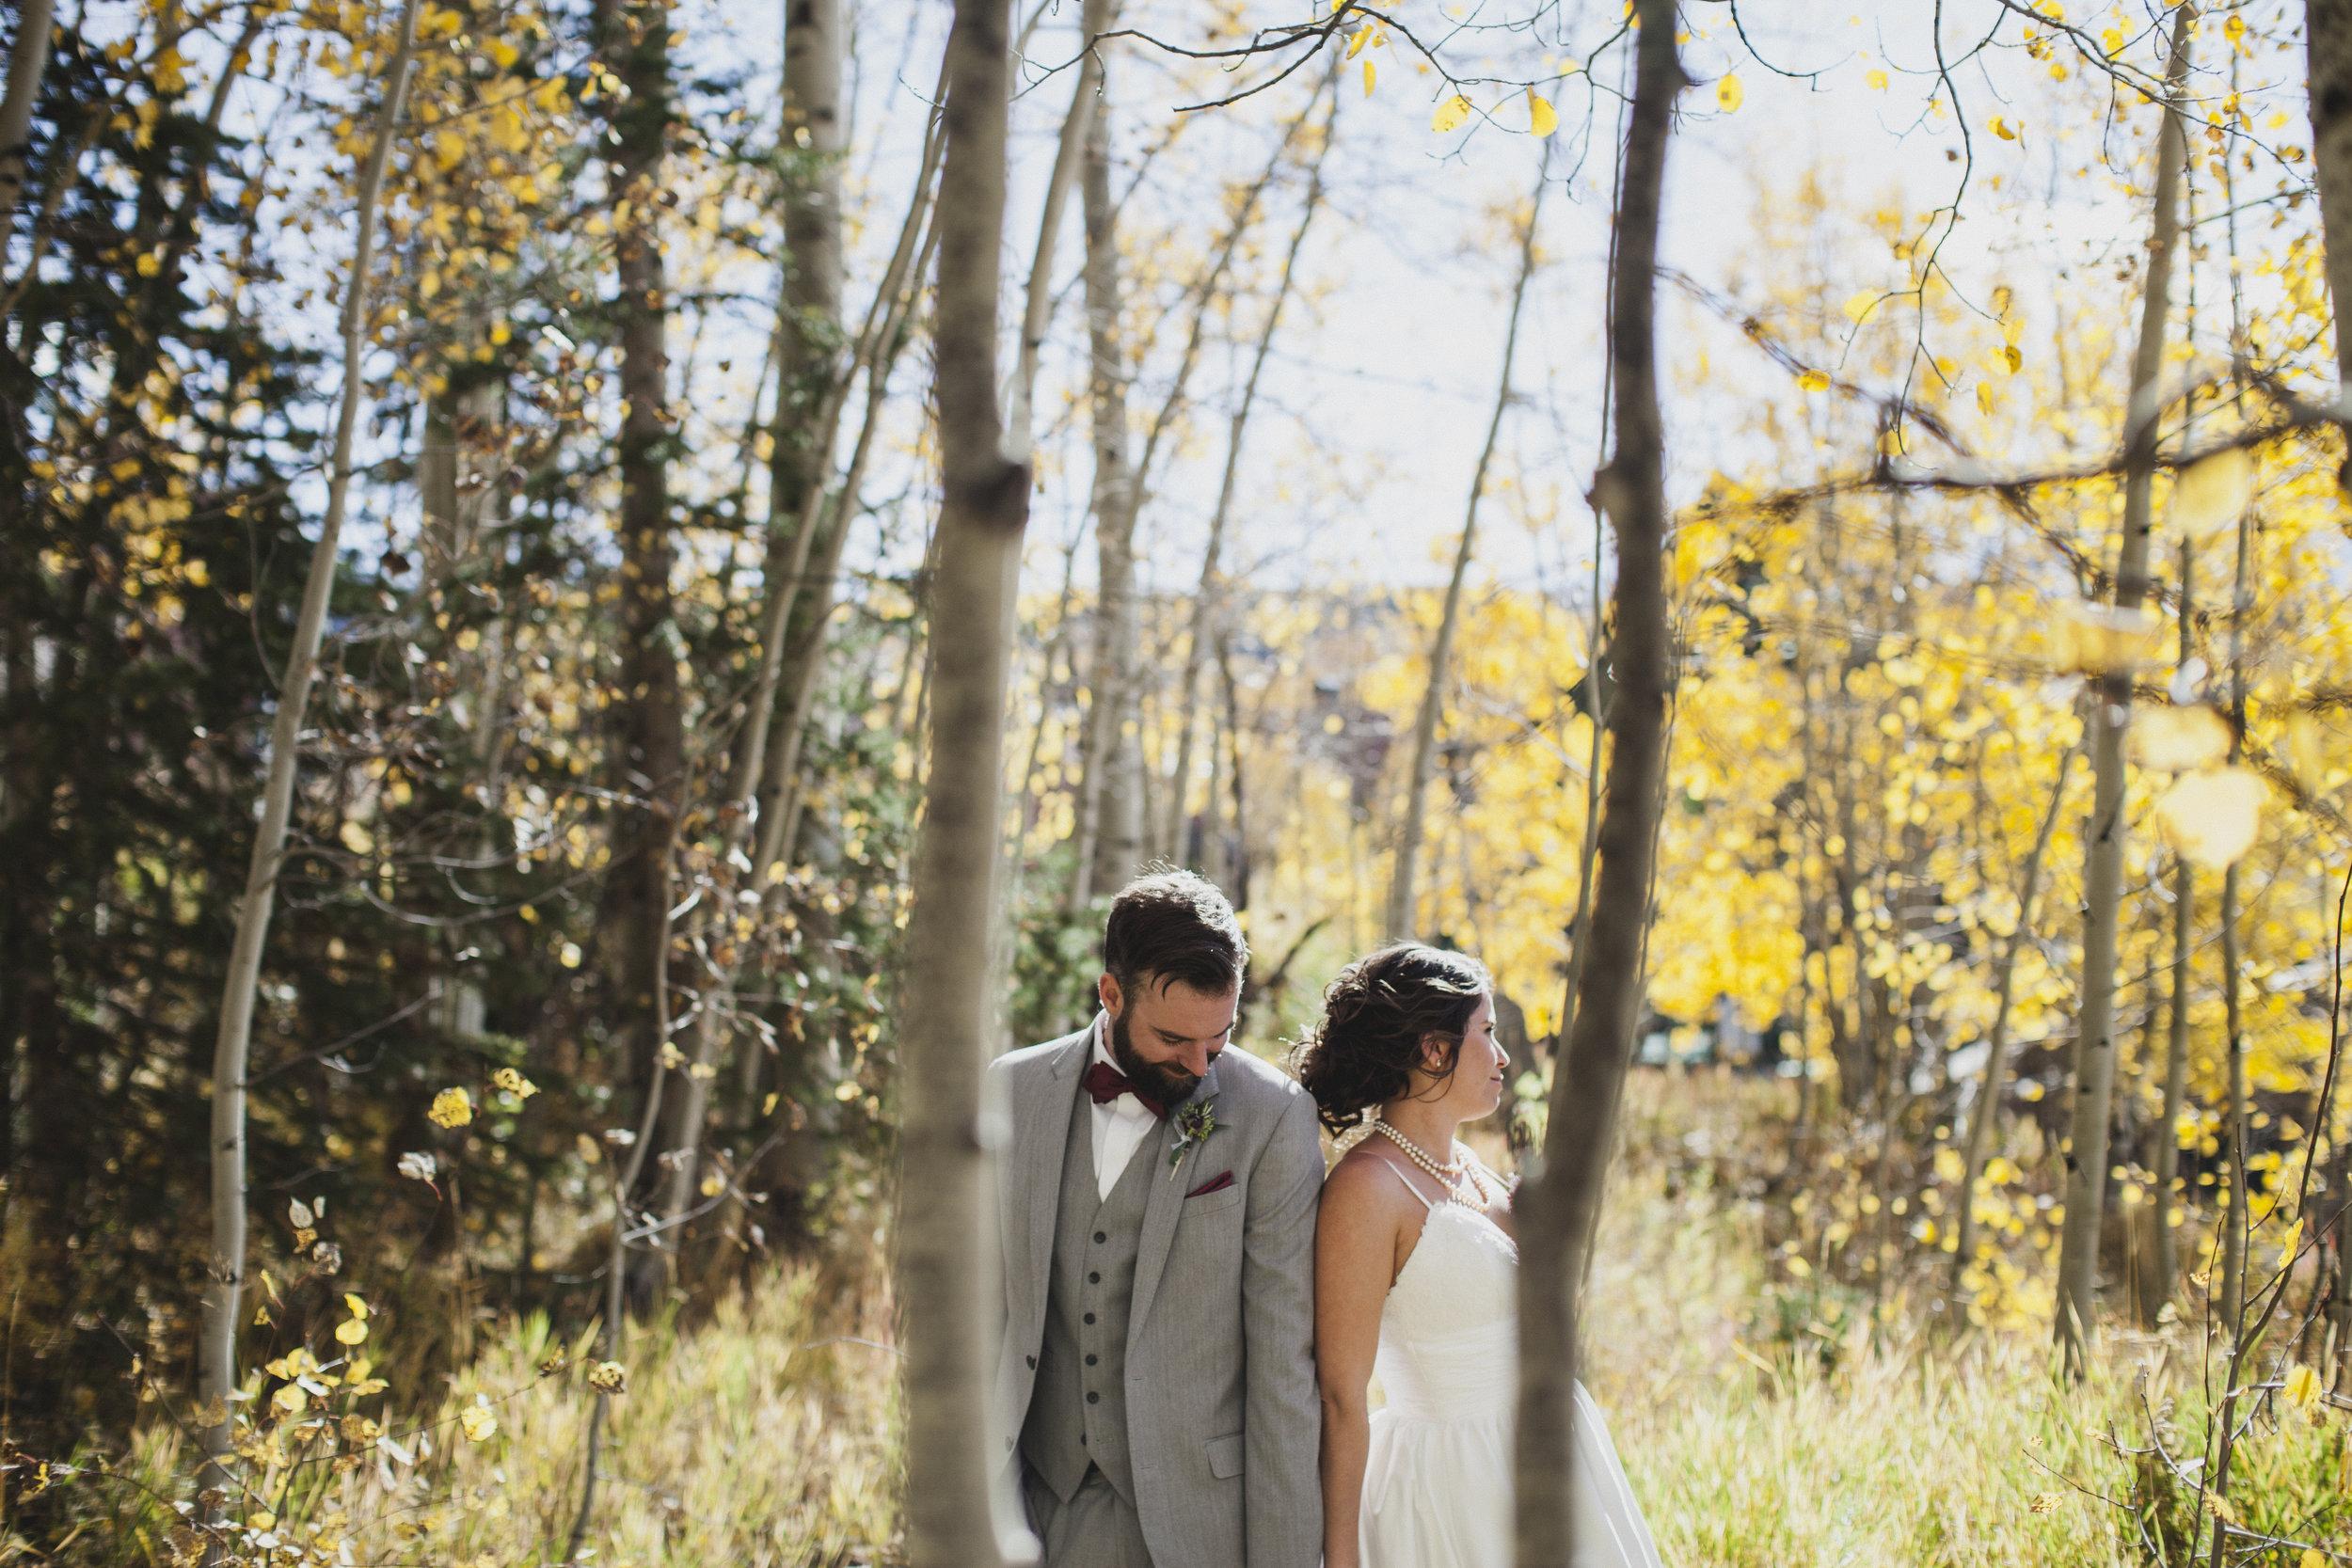 NE-LeahandAshtonphotography-Telluride-Wedding-Photography-7184.jpg